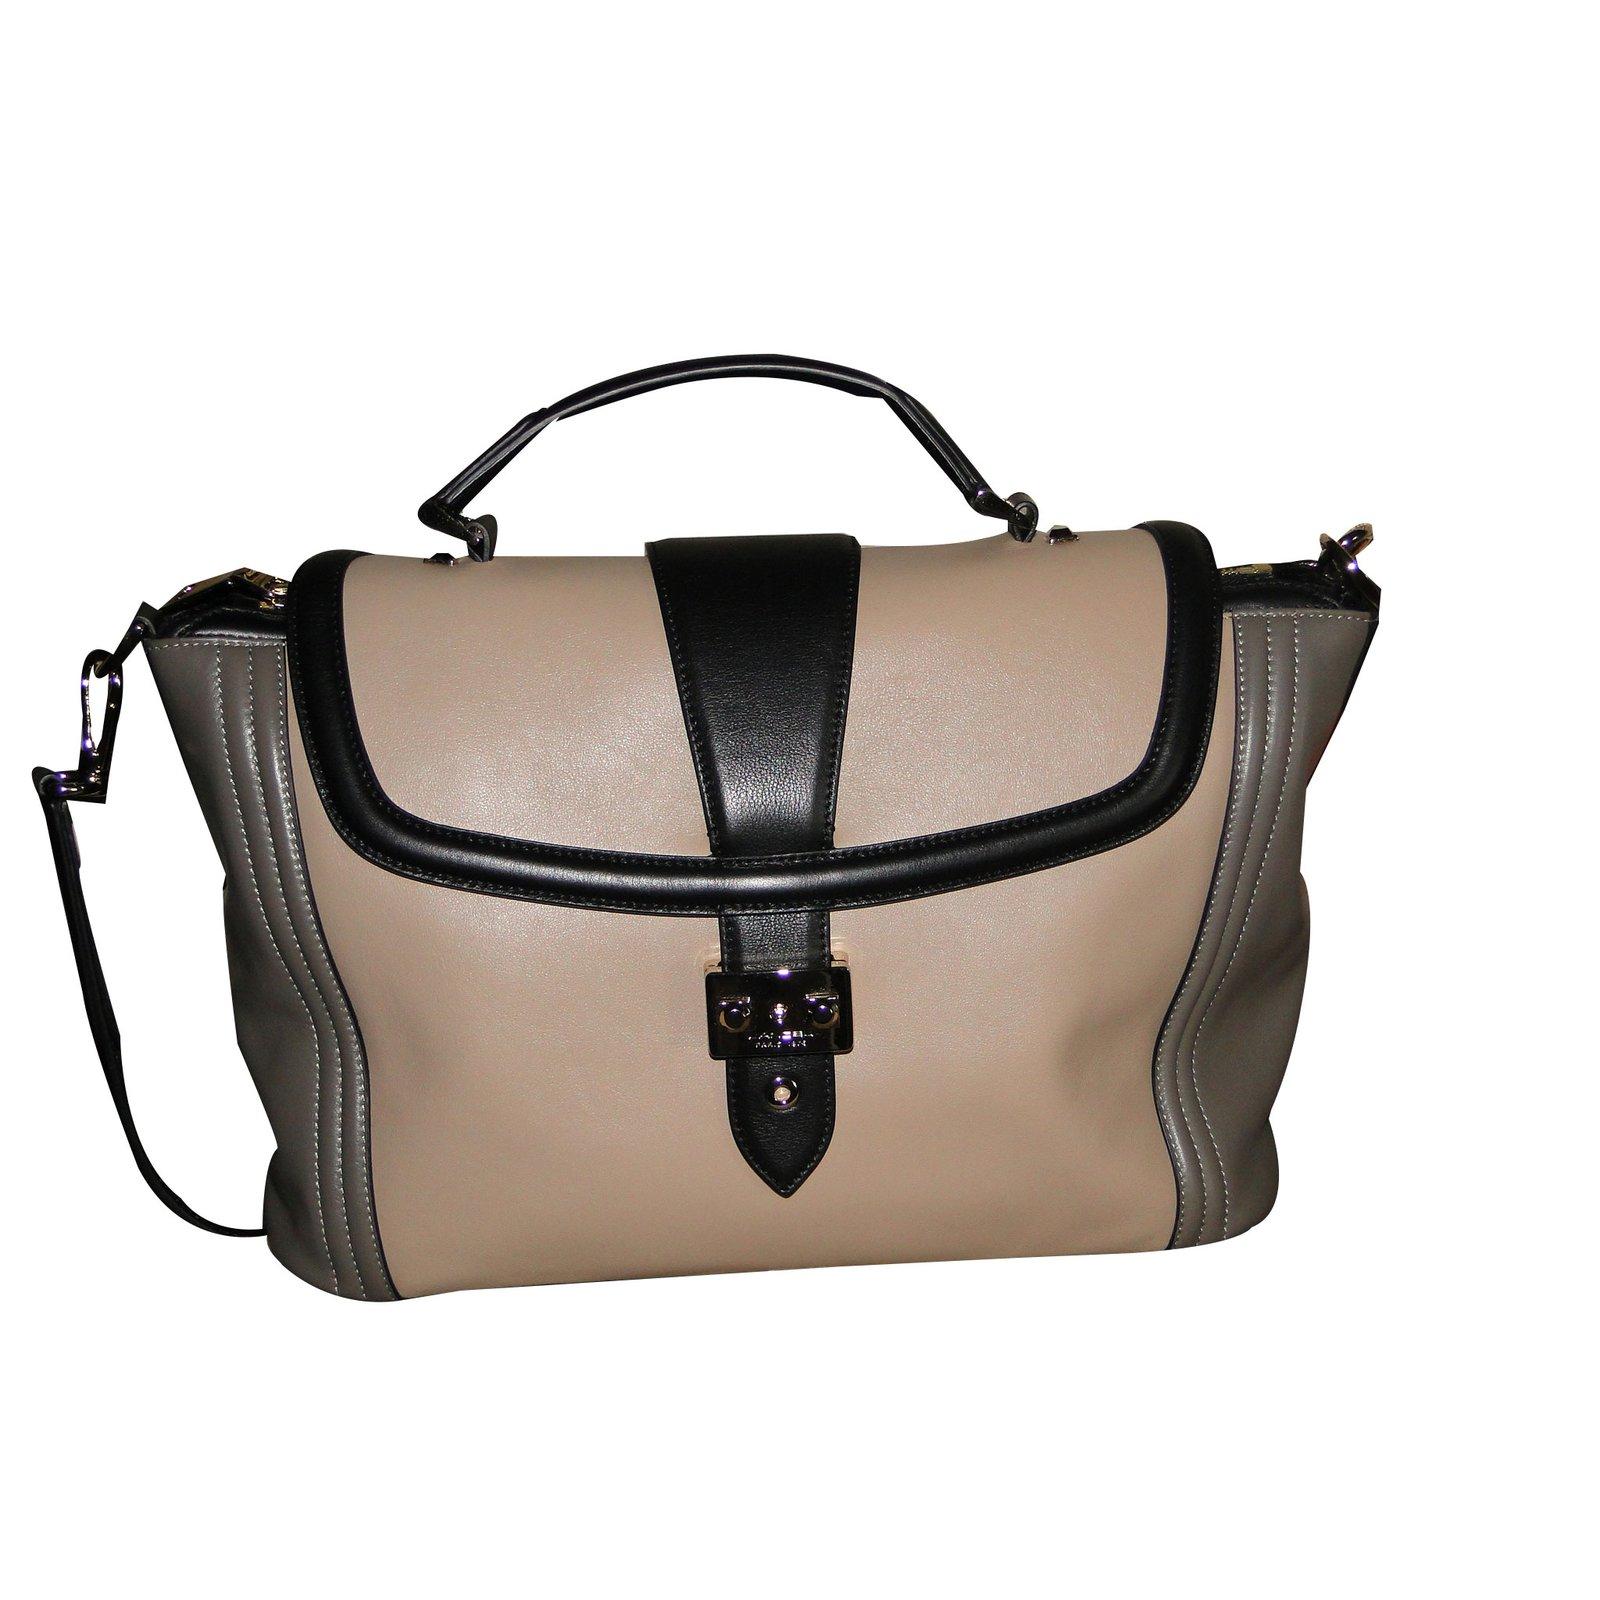 af24c0149c1b Lancel Beige Handbag GFtlHU4Zl9 - zanarasabina.com